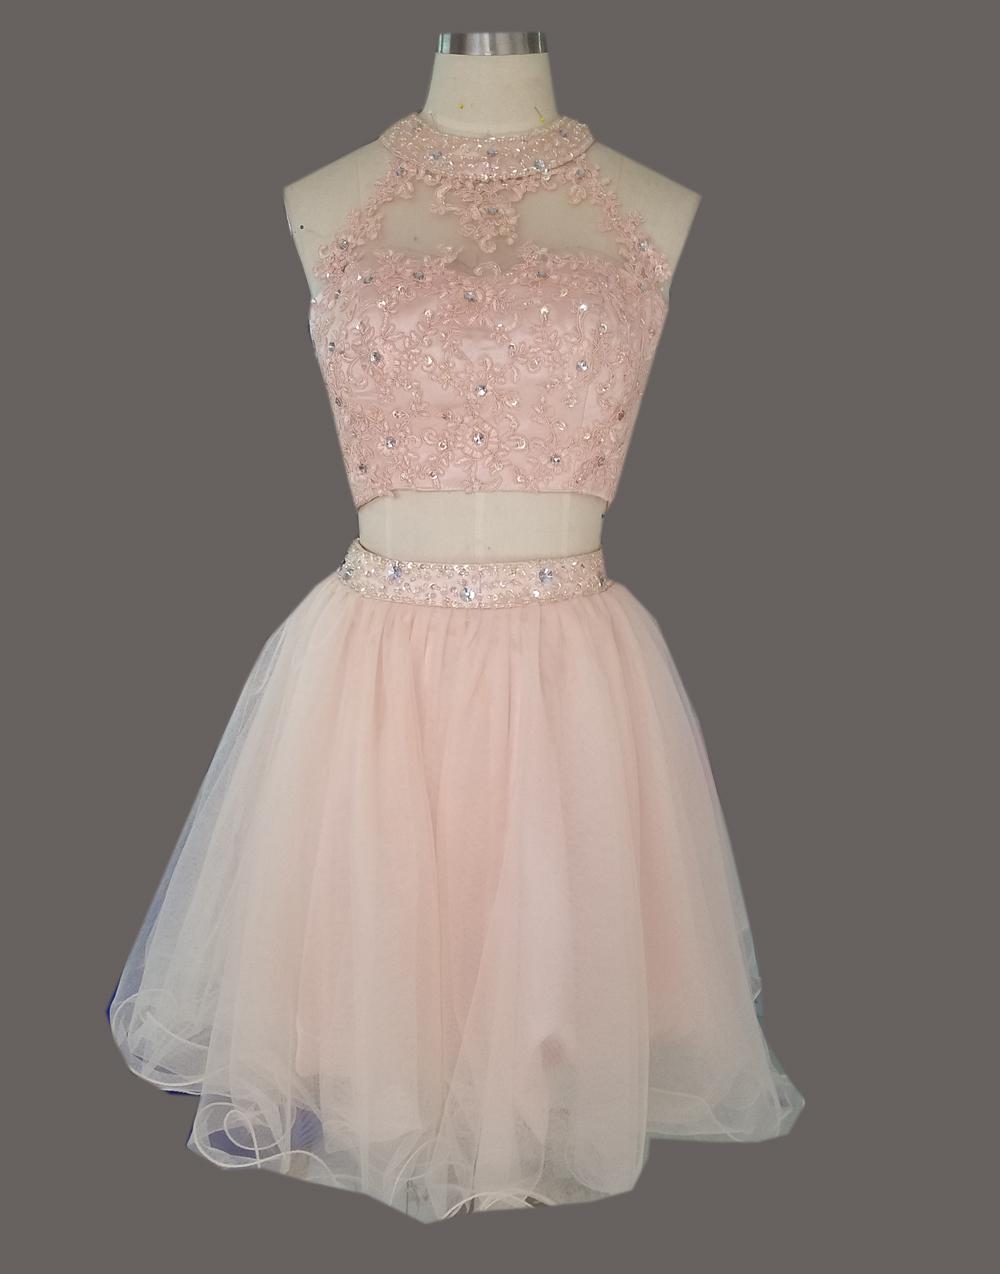 Short Prom Dresses Size 0 48